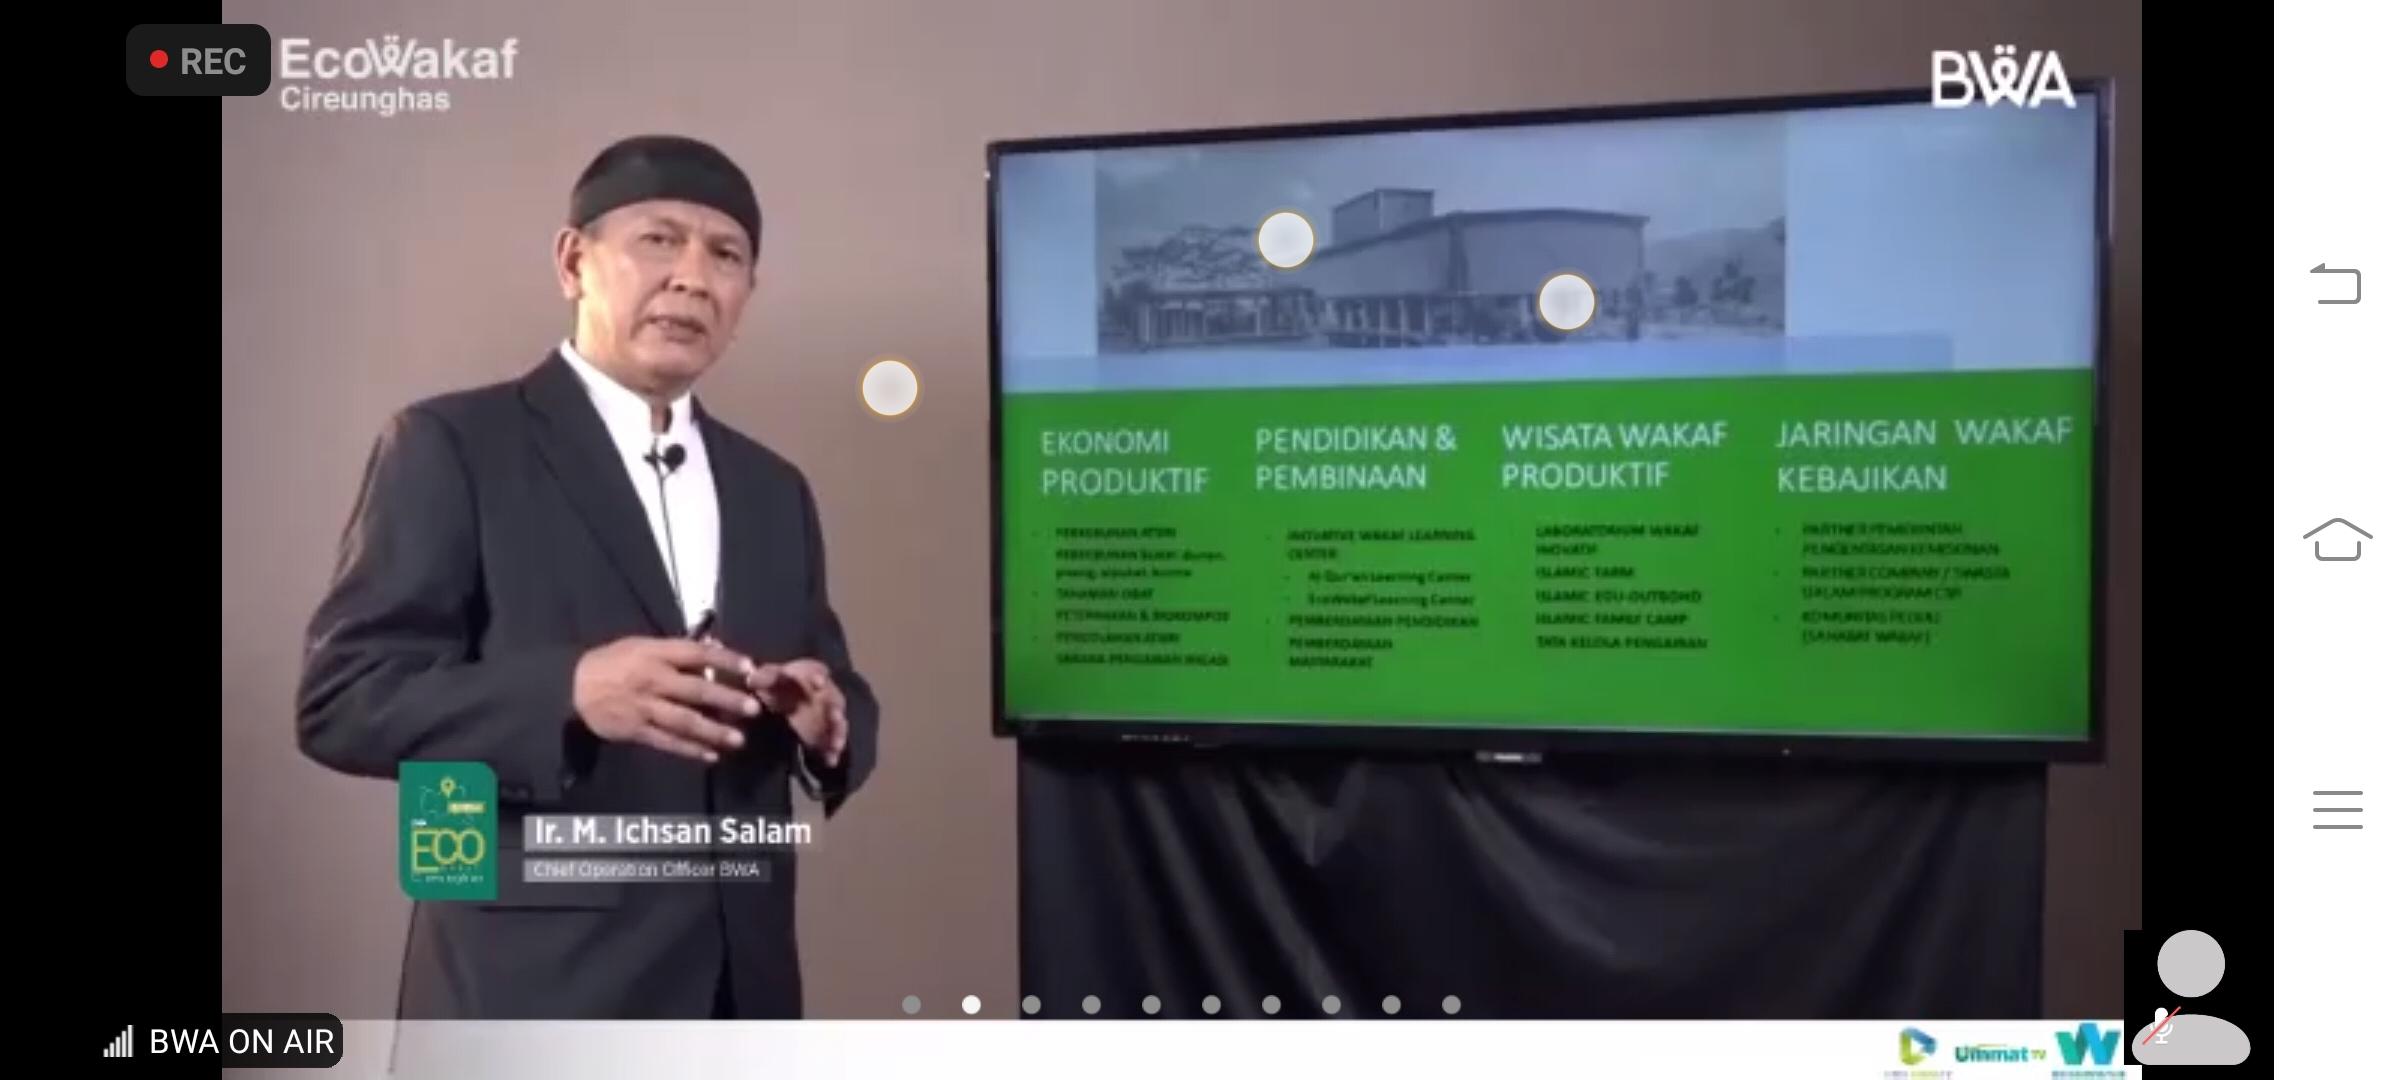 Wakaf Produktif Ecowakaf Cireunghas Untuk Pendidikan Anak Indonesia